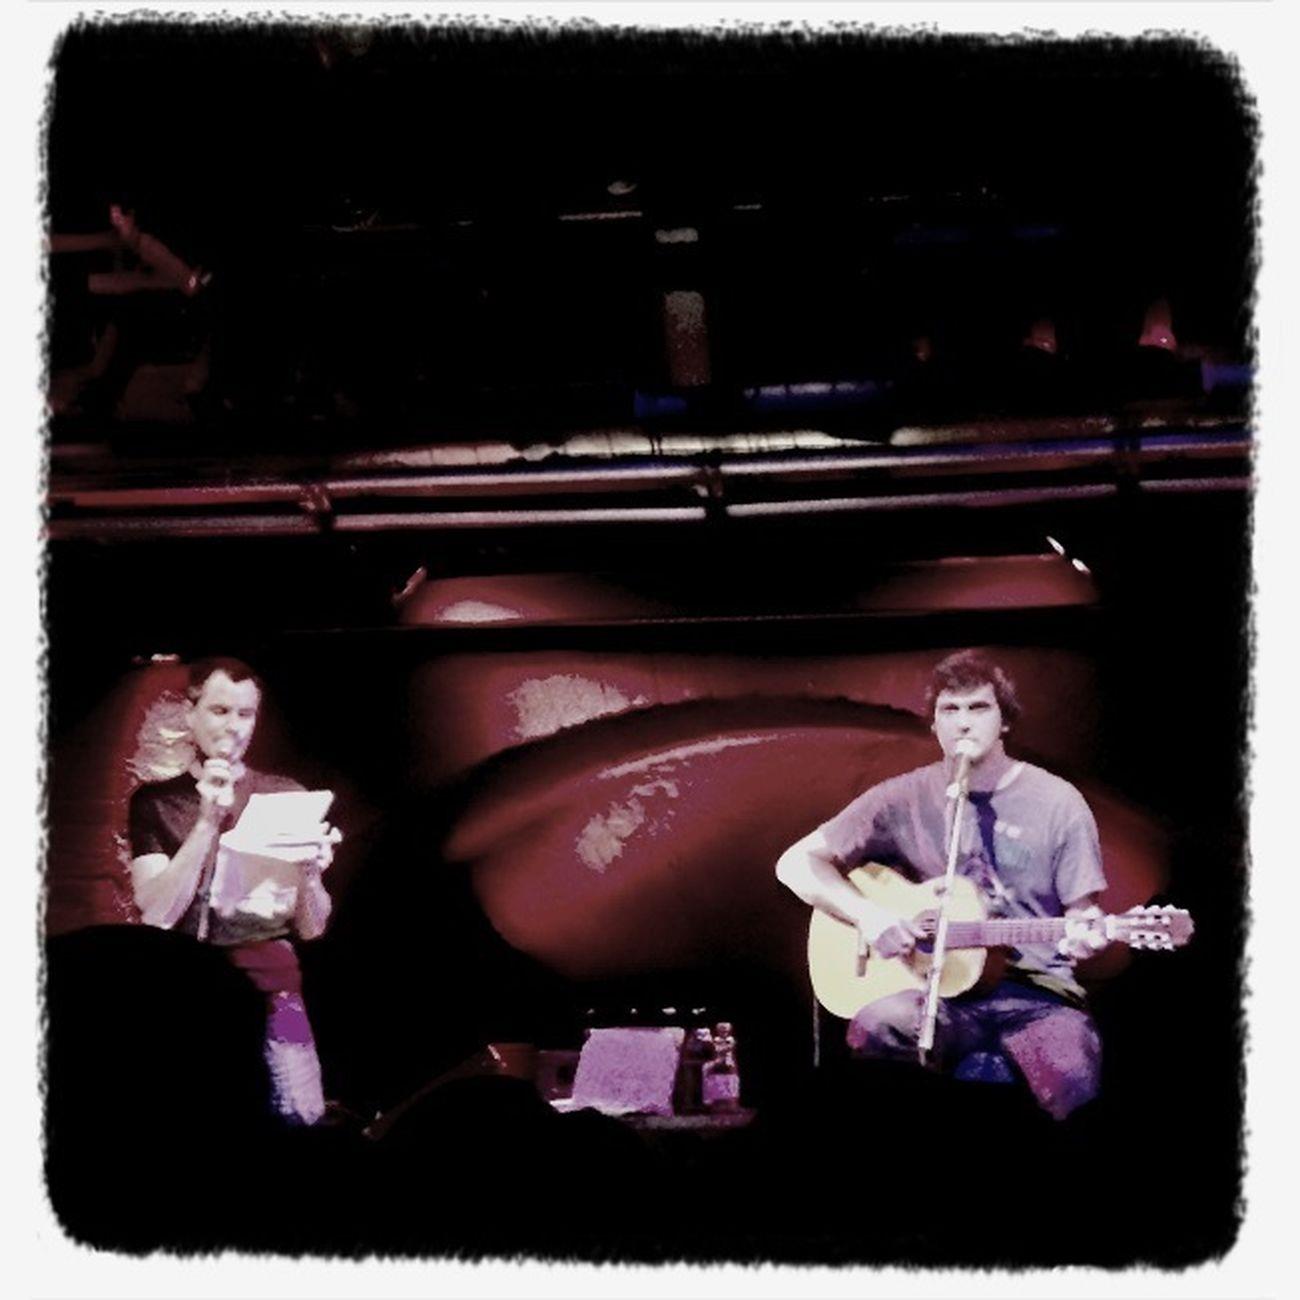 Christoph (links, am Schummler) und Lollo (rechts, an der Gitarre).